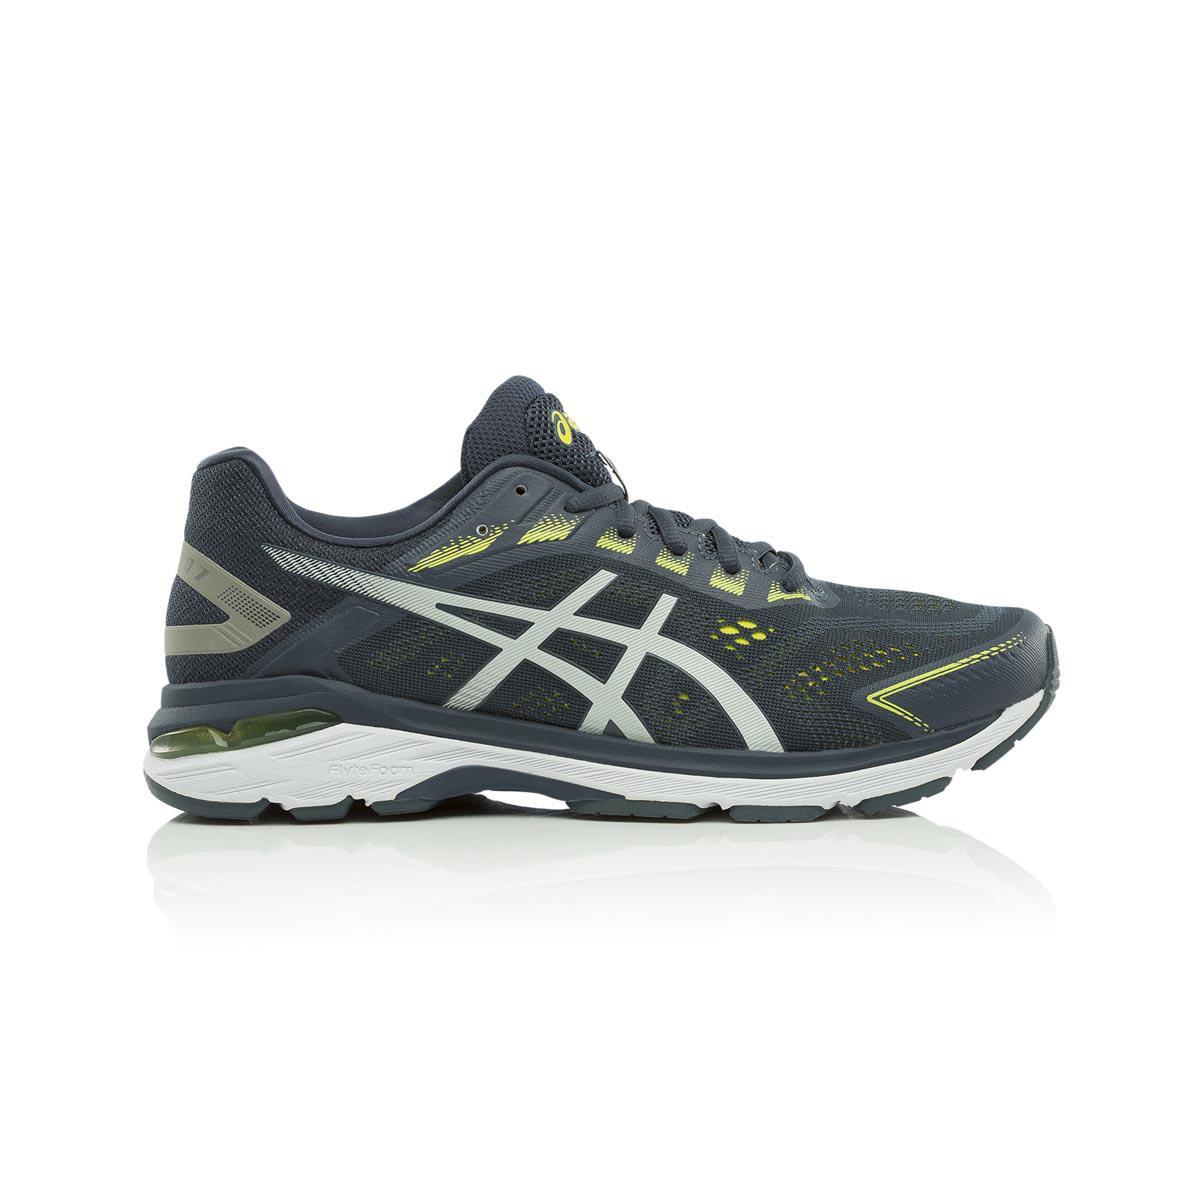 Asics GT 2000 7 Running Shoes - Mens US